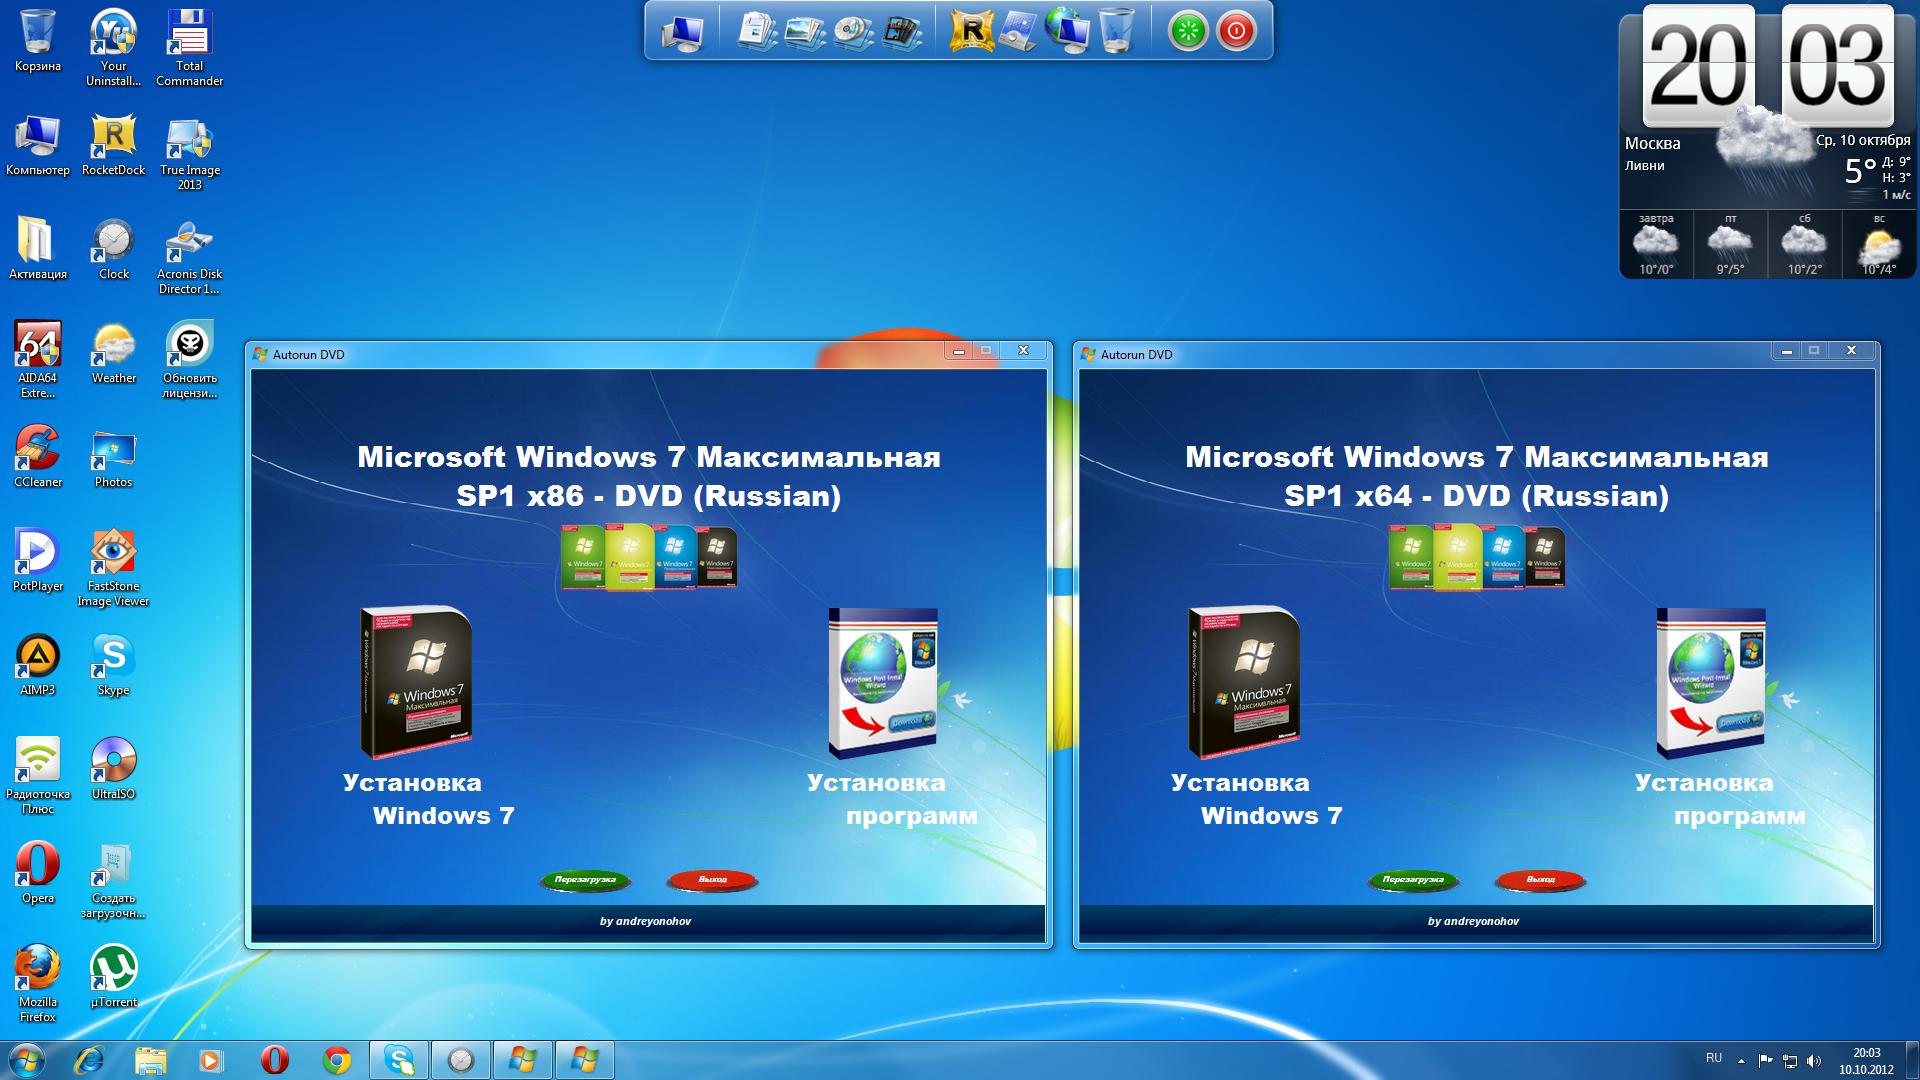 Windows 7 Sp1 X64 .Iso File